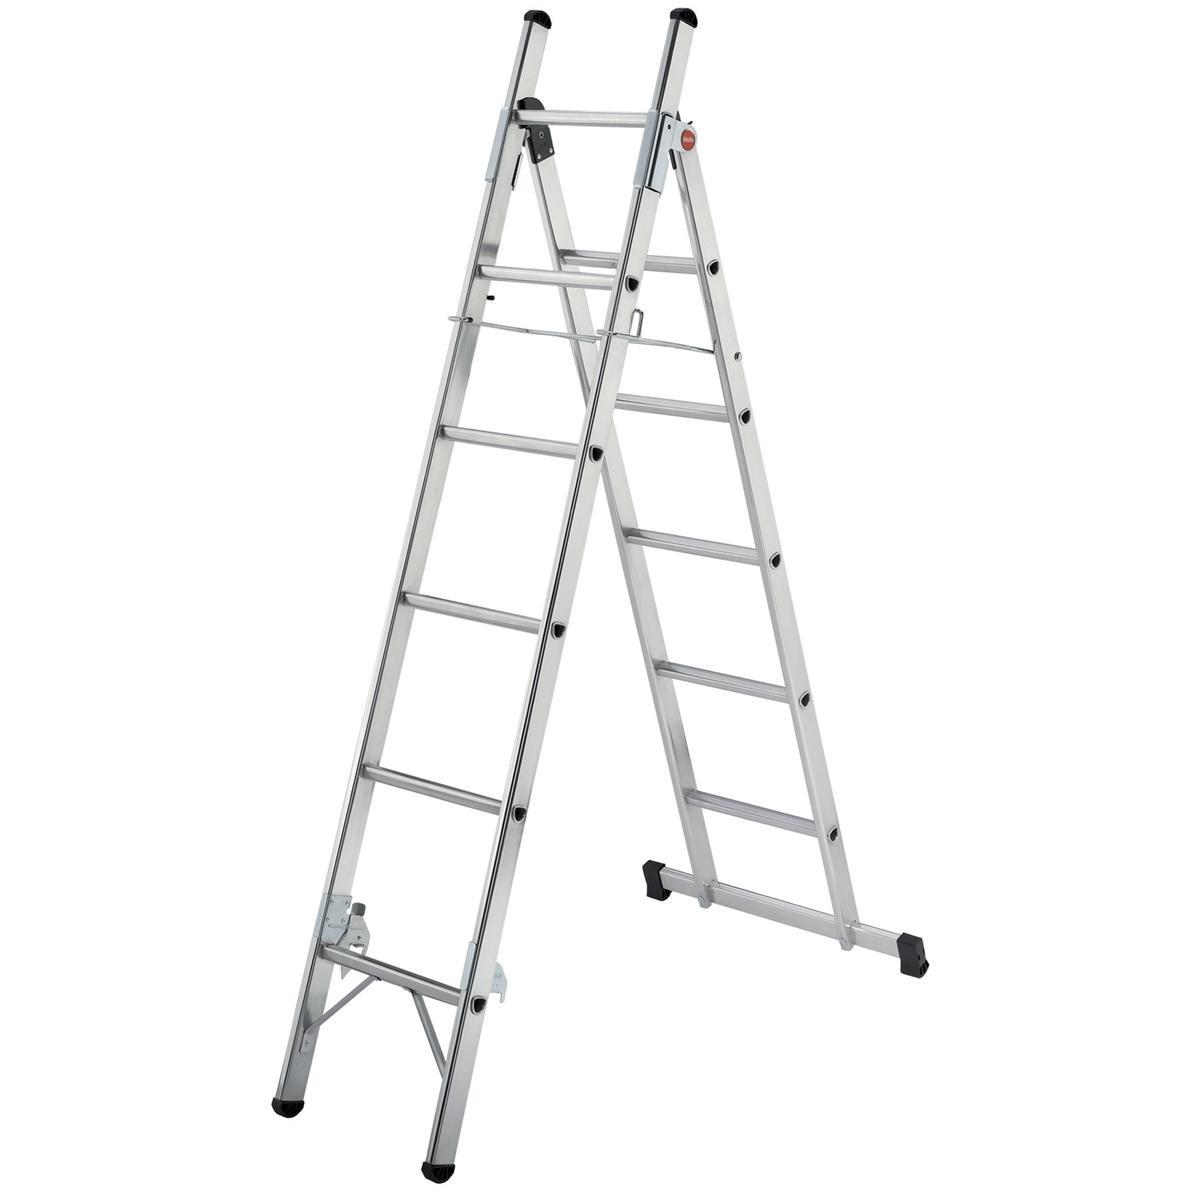 Convertible Household Ladder 3 Way 5 Tread Capacity 150kg 5.6kg Aluminium